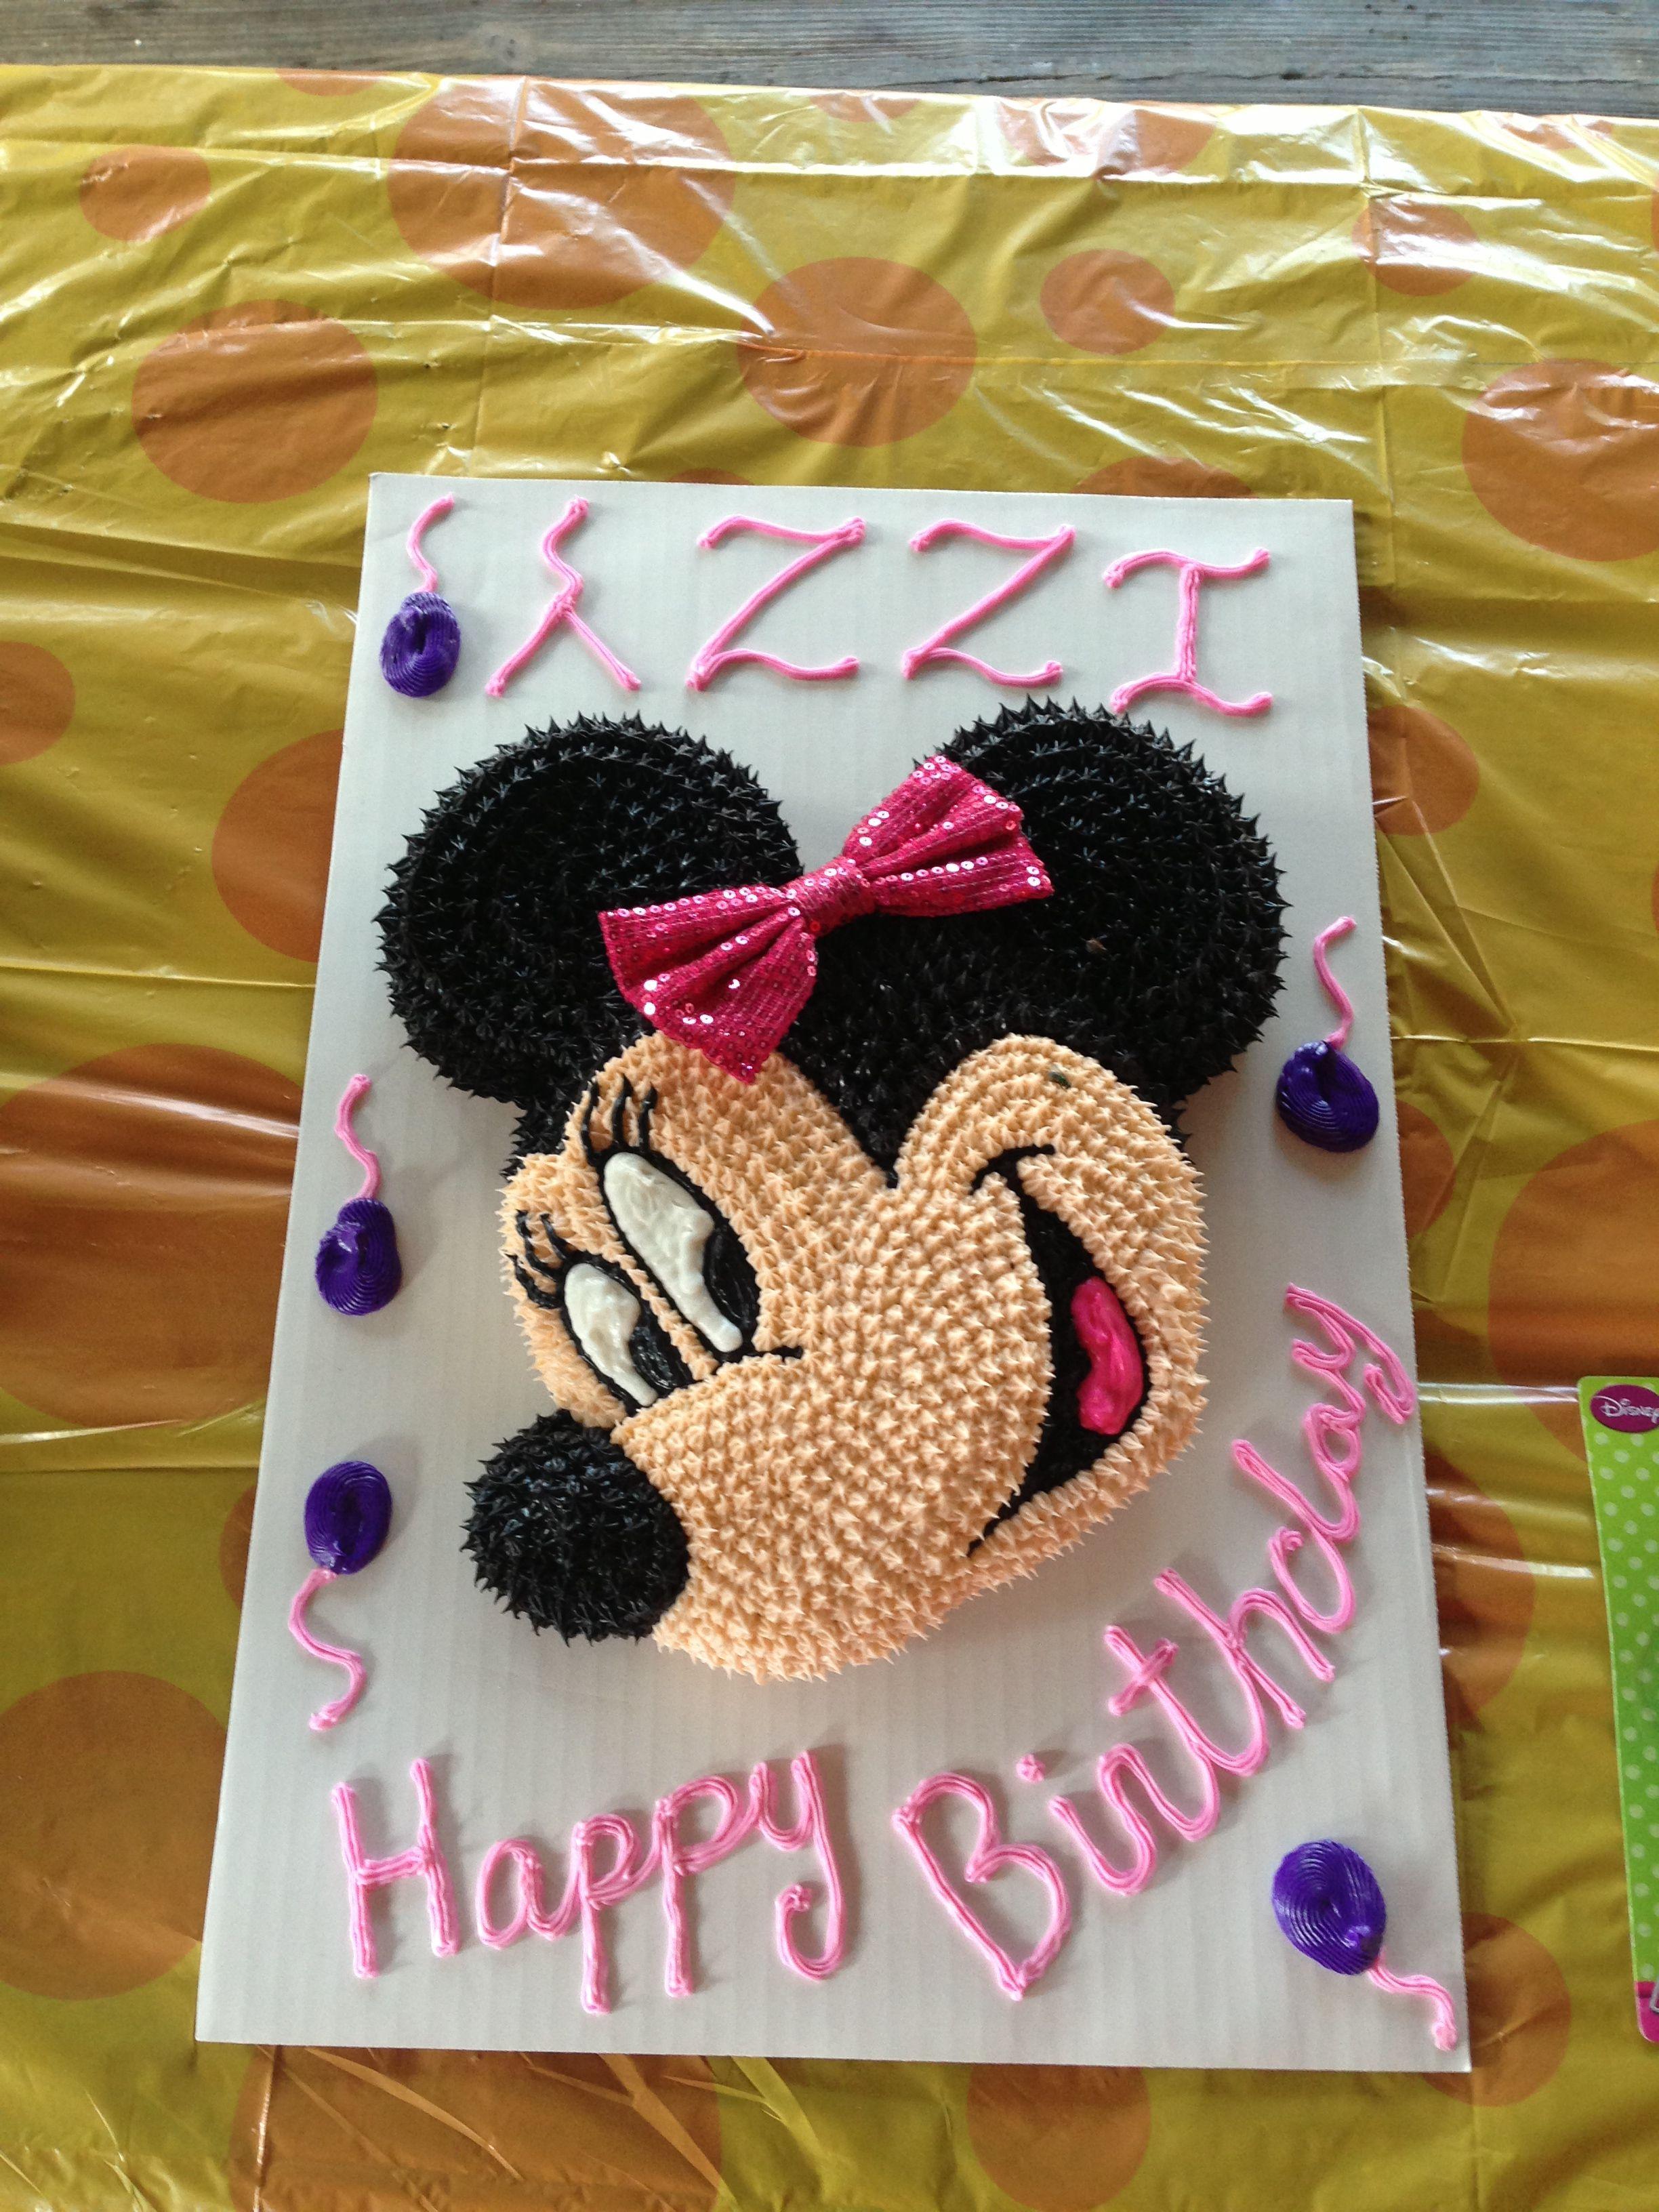 Izzys minnie mouse cake by debbie minnie mouse cake